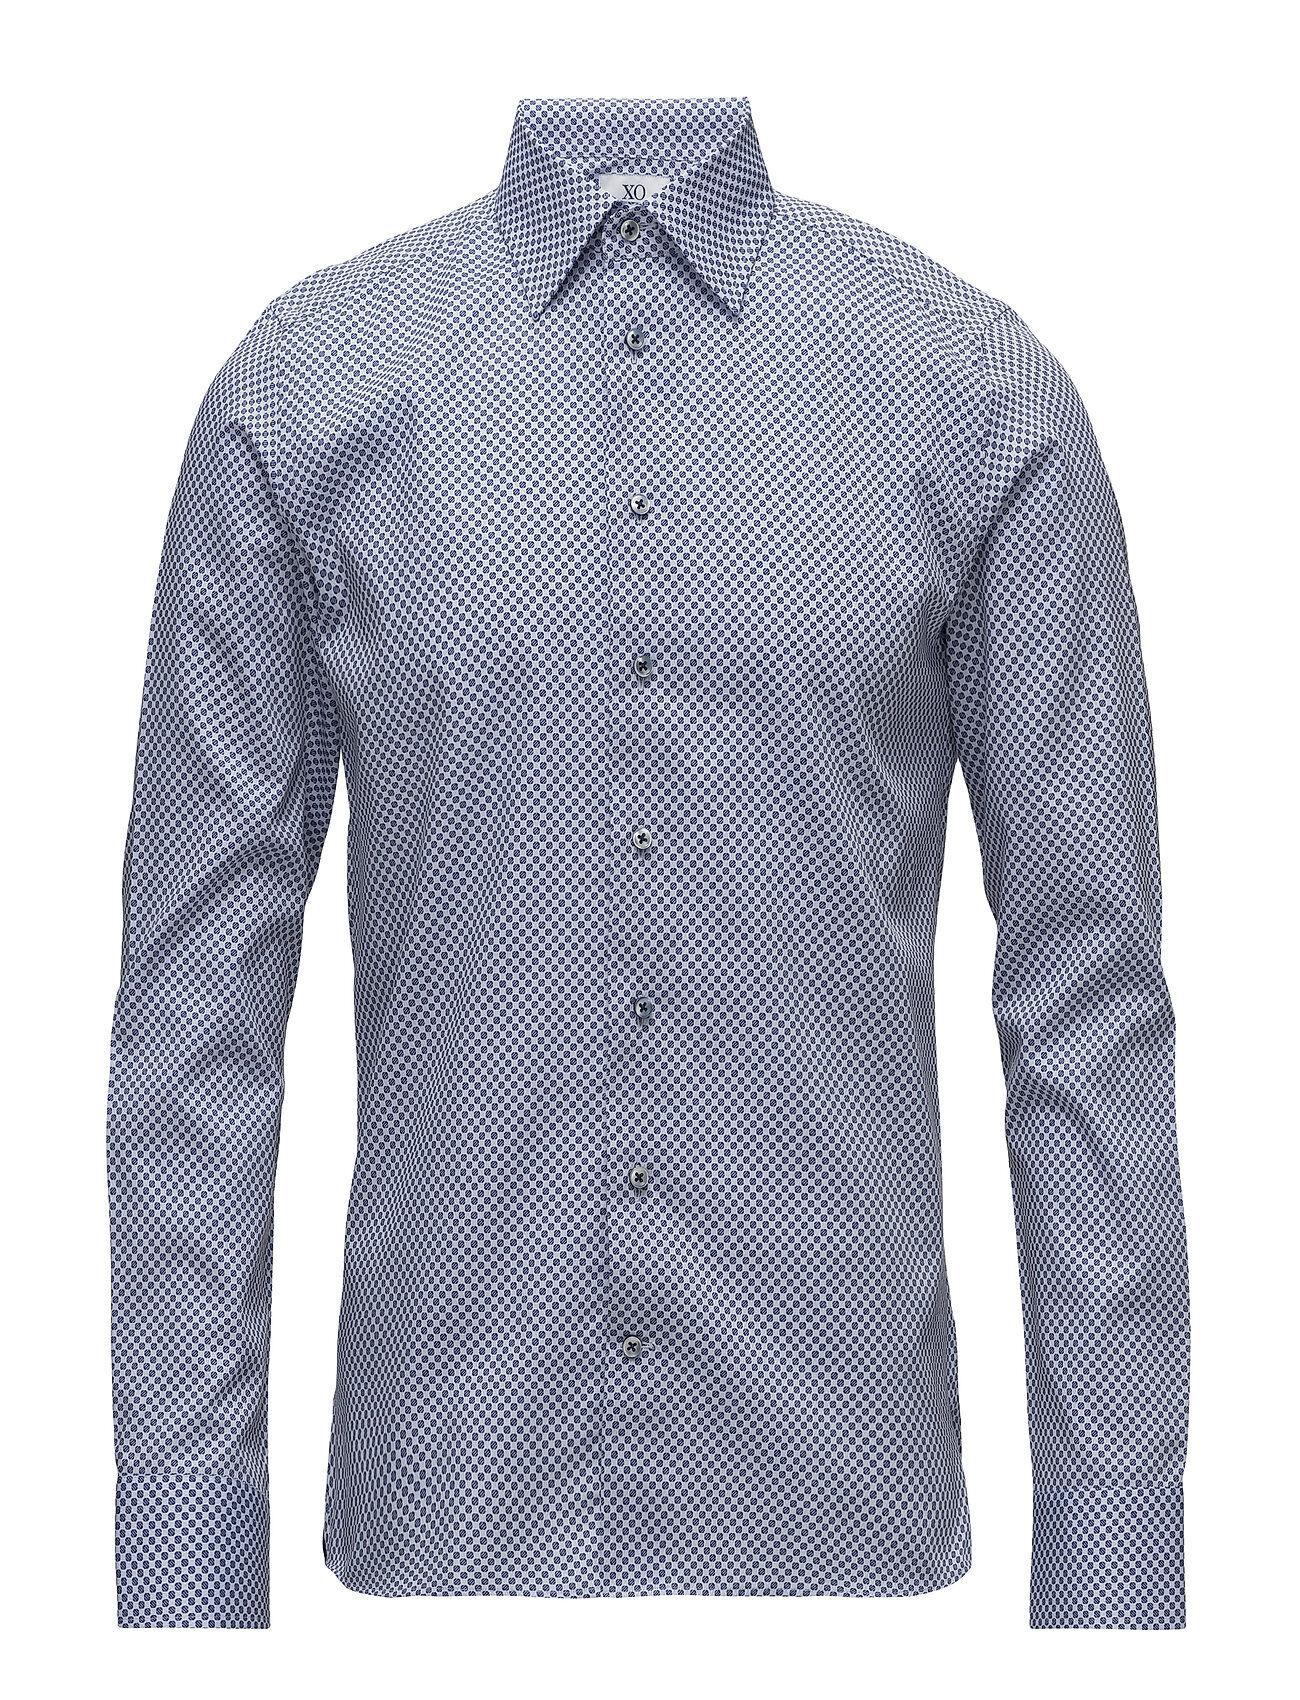 XO Shirtmaker by Sand Copenhagen 8001 - Jake Sc